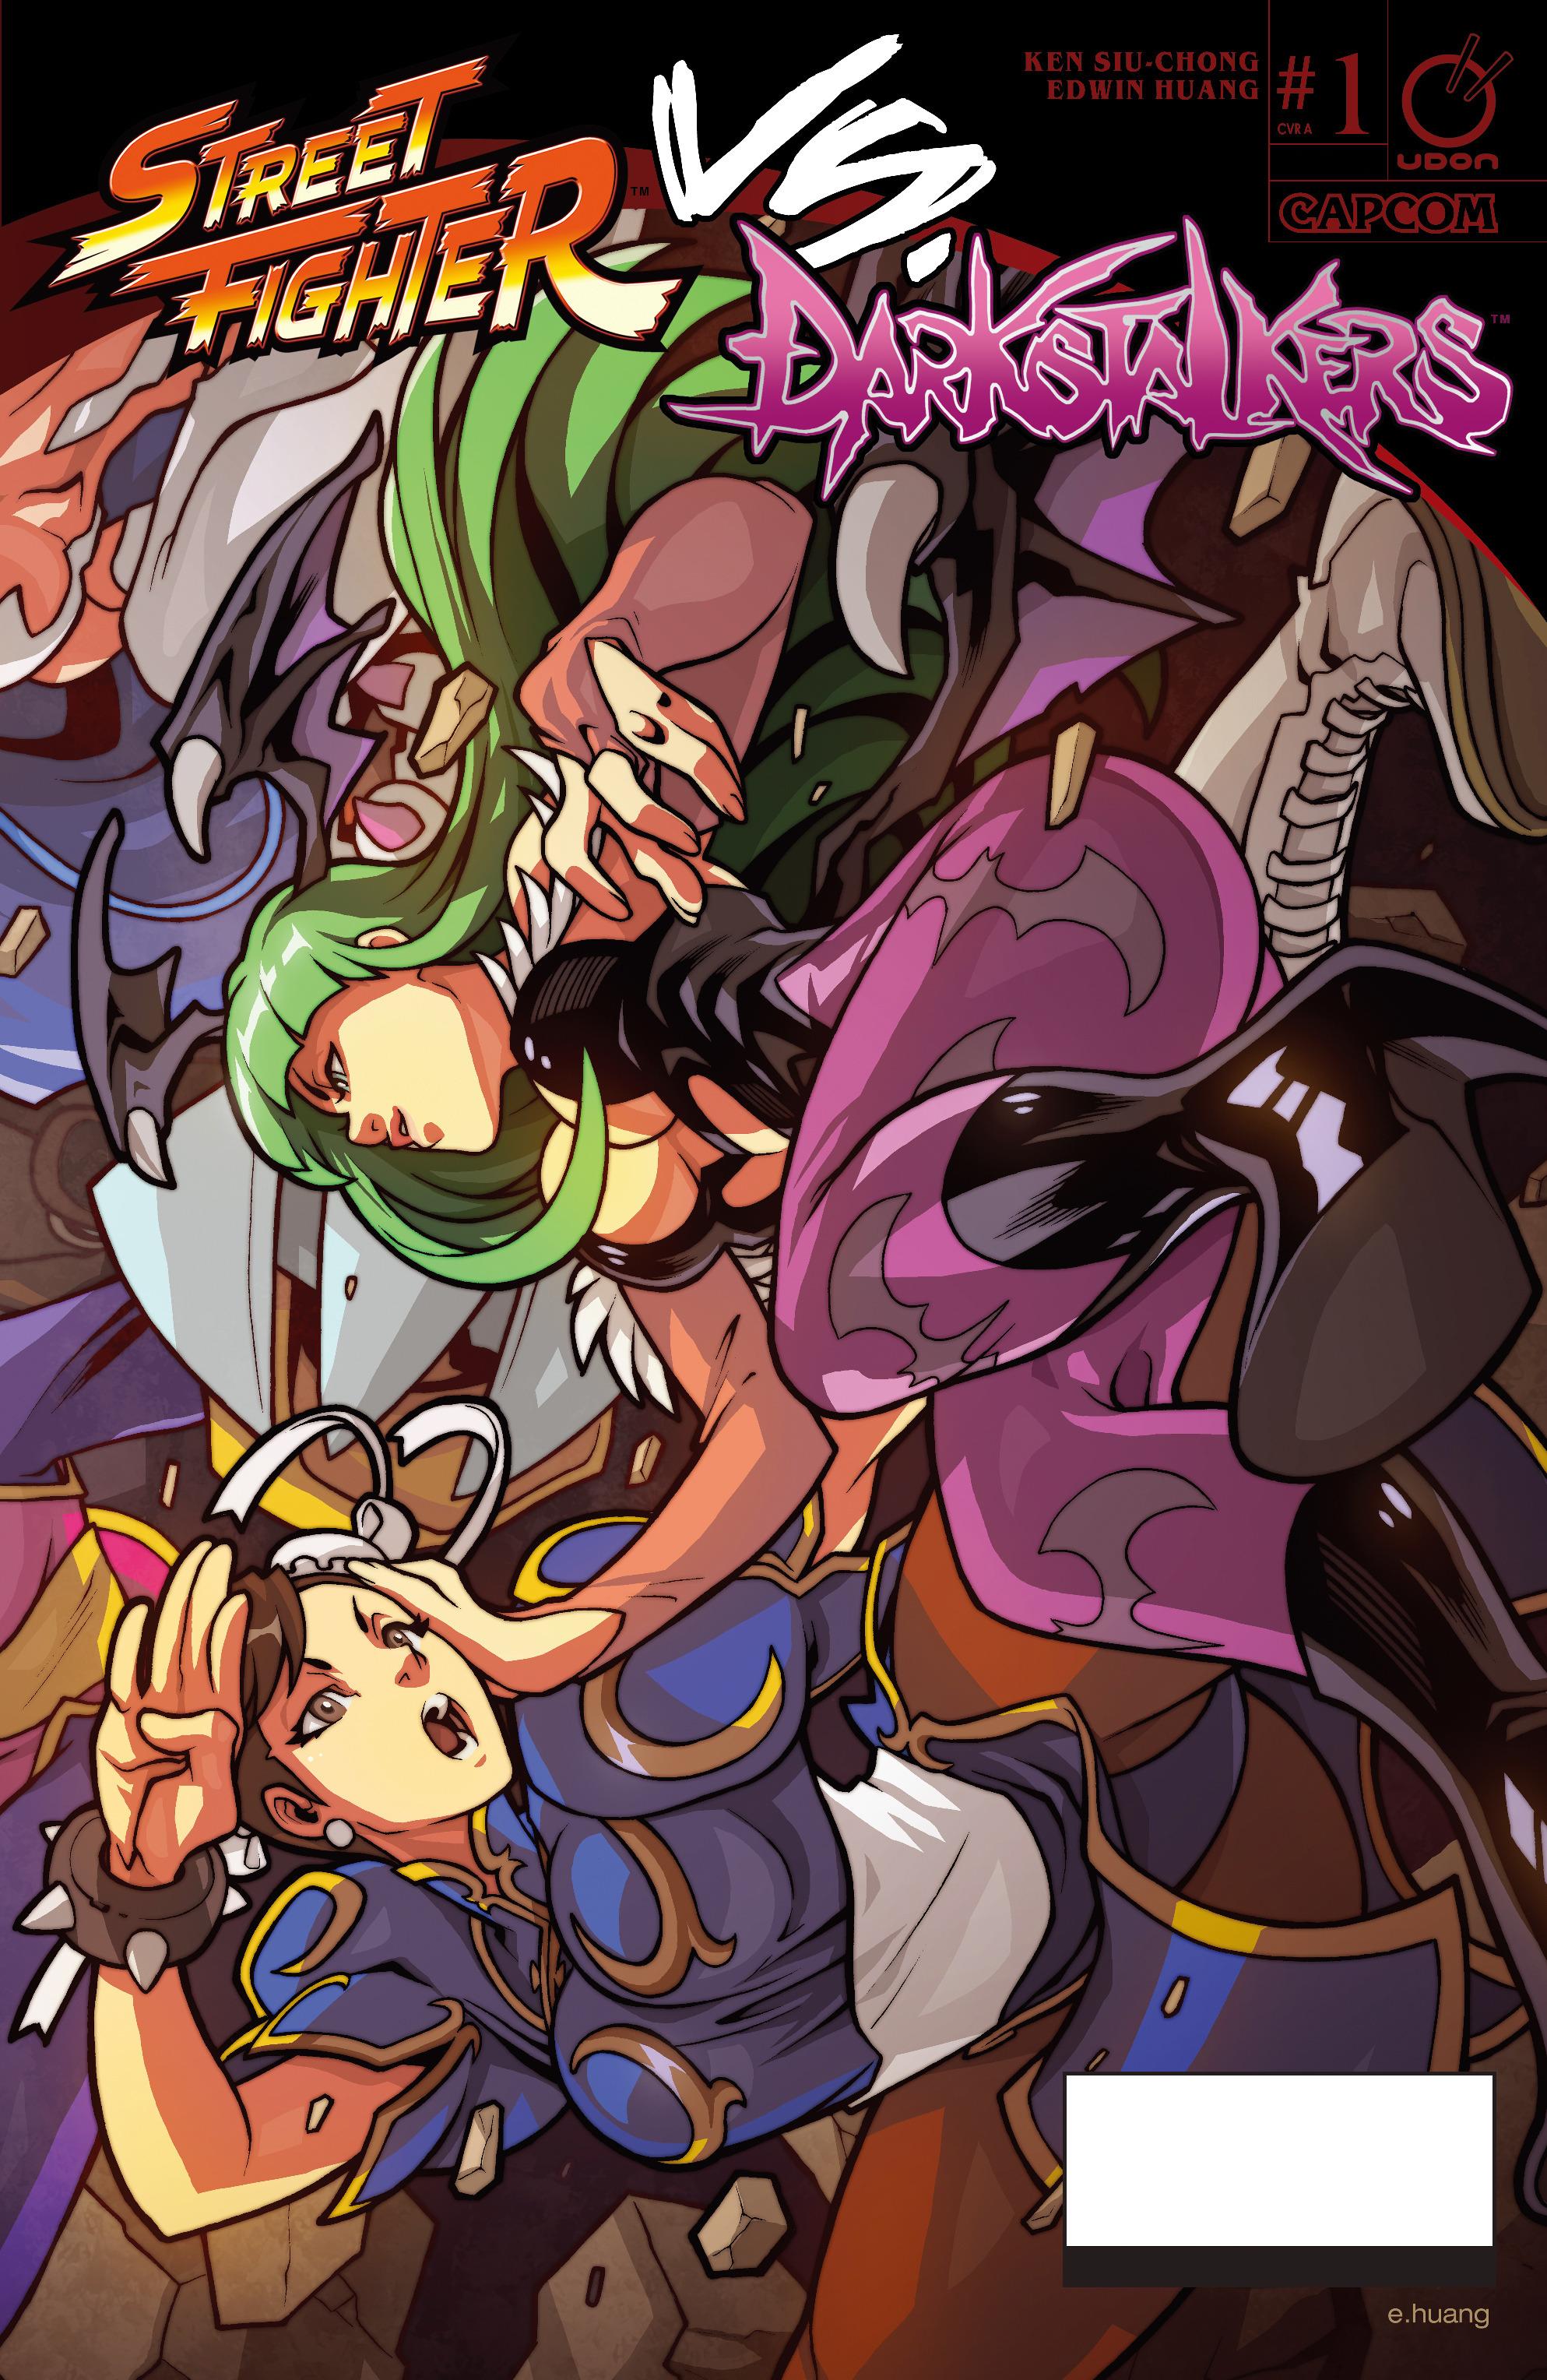 Read online Street Fighter VS Darkstalkers comic -  Issue #1 - 1